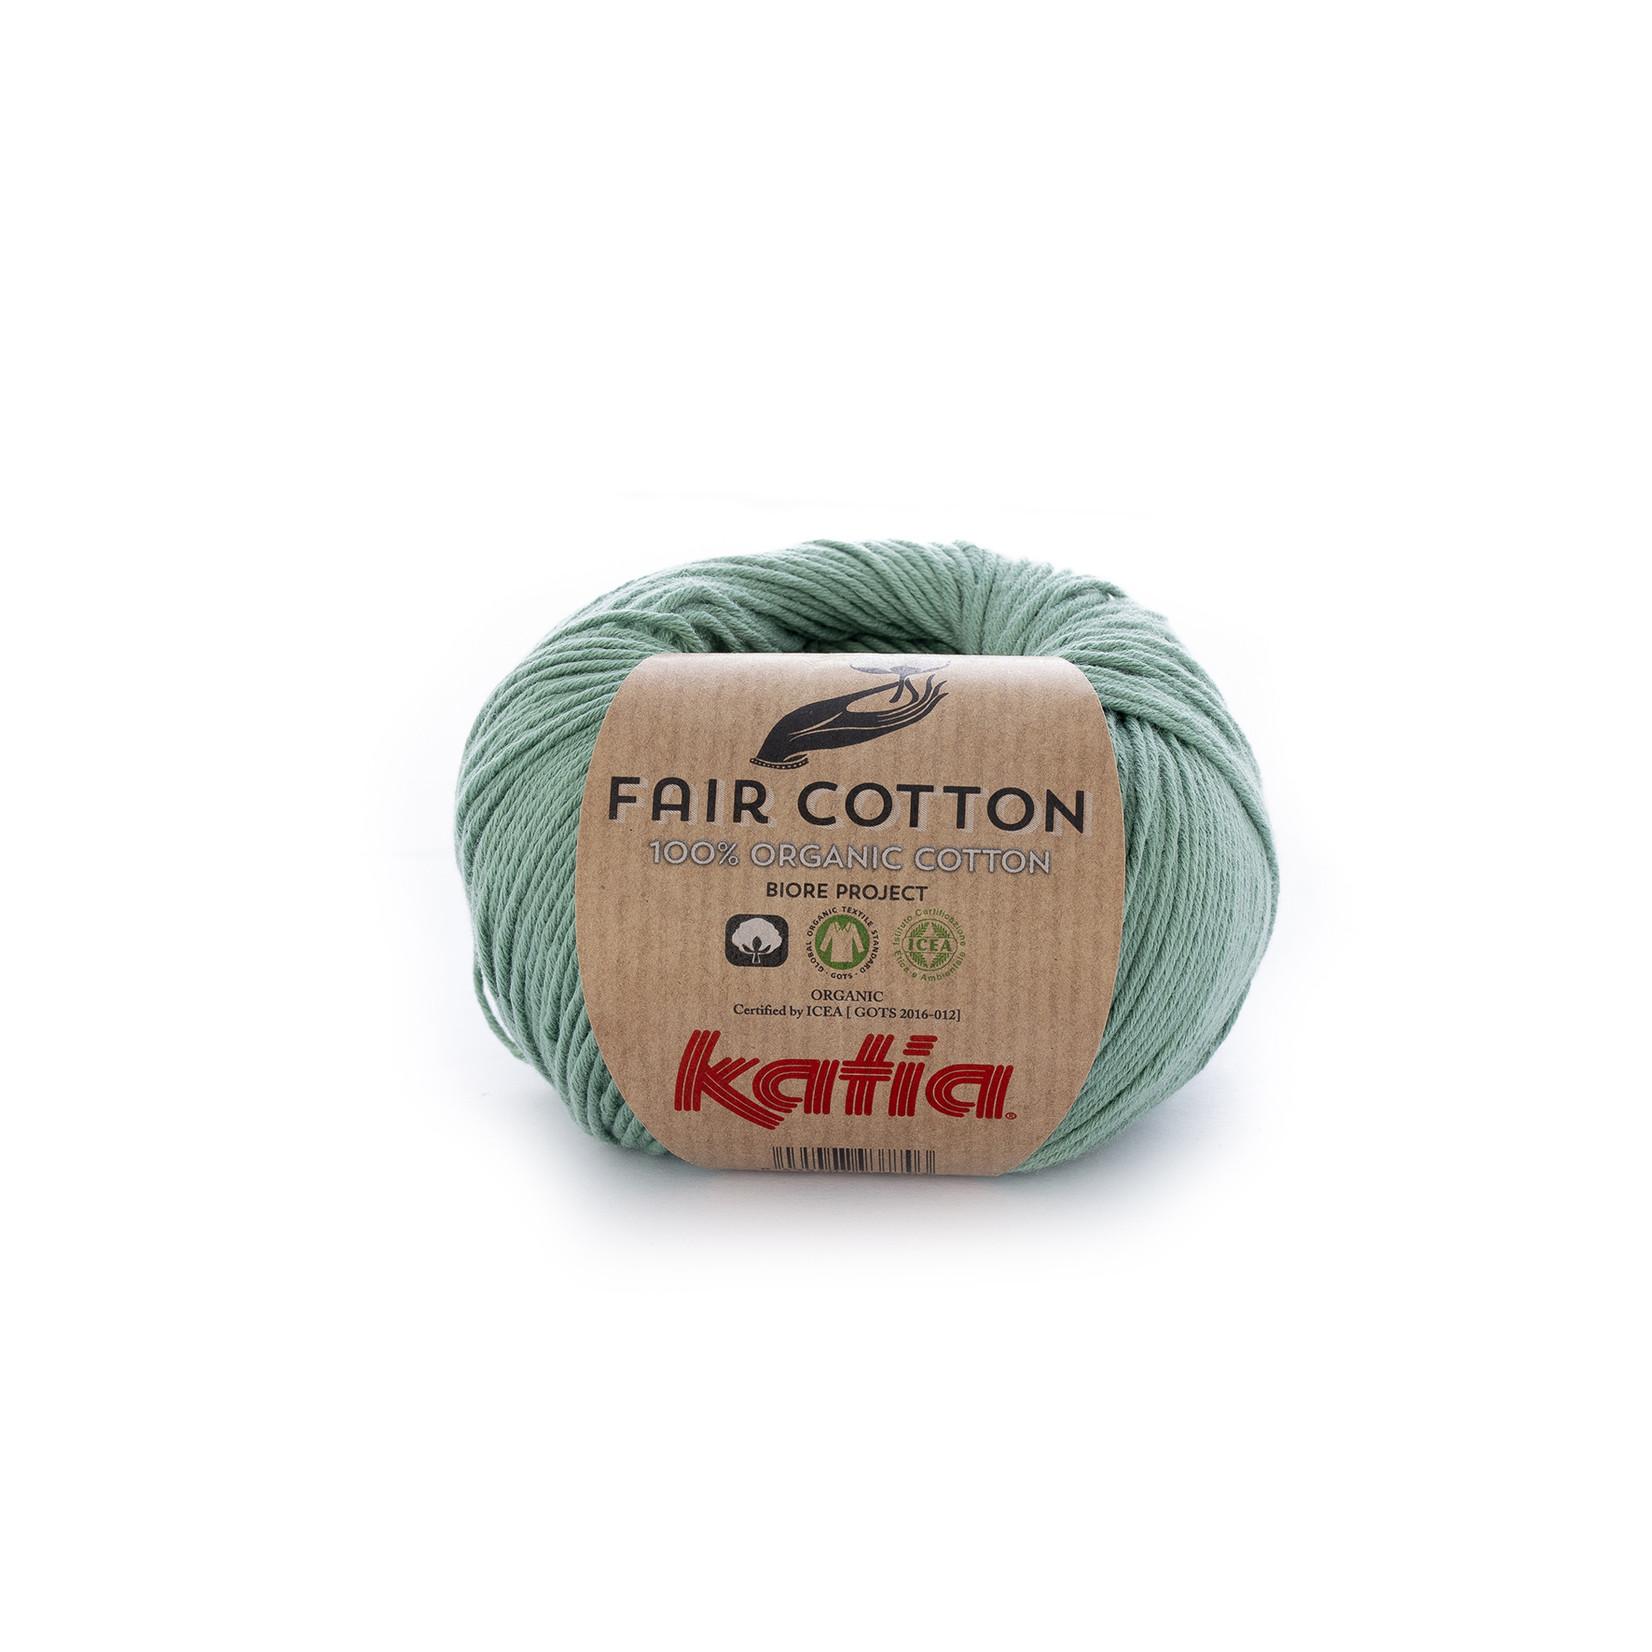 Katia Katia Fair Cotton 17 - mintgroen - 1 bol = 50 gr. = 155 m. - 100% biol. katoen